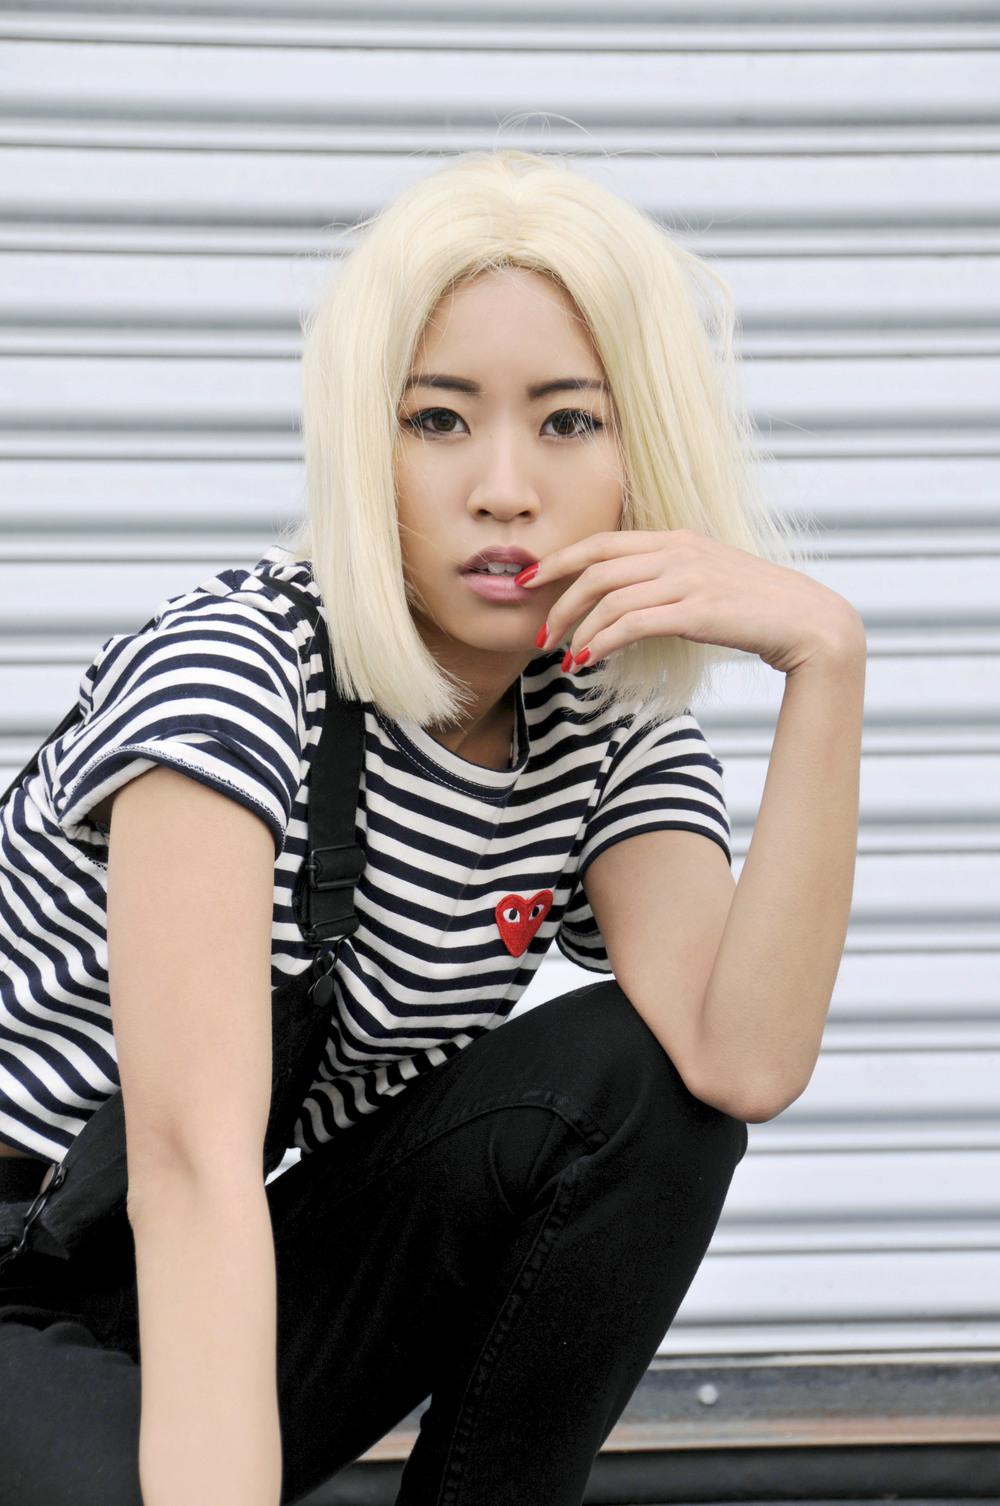 Blonde_Overalls_7